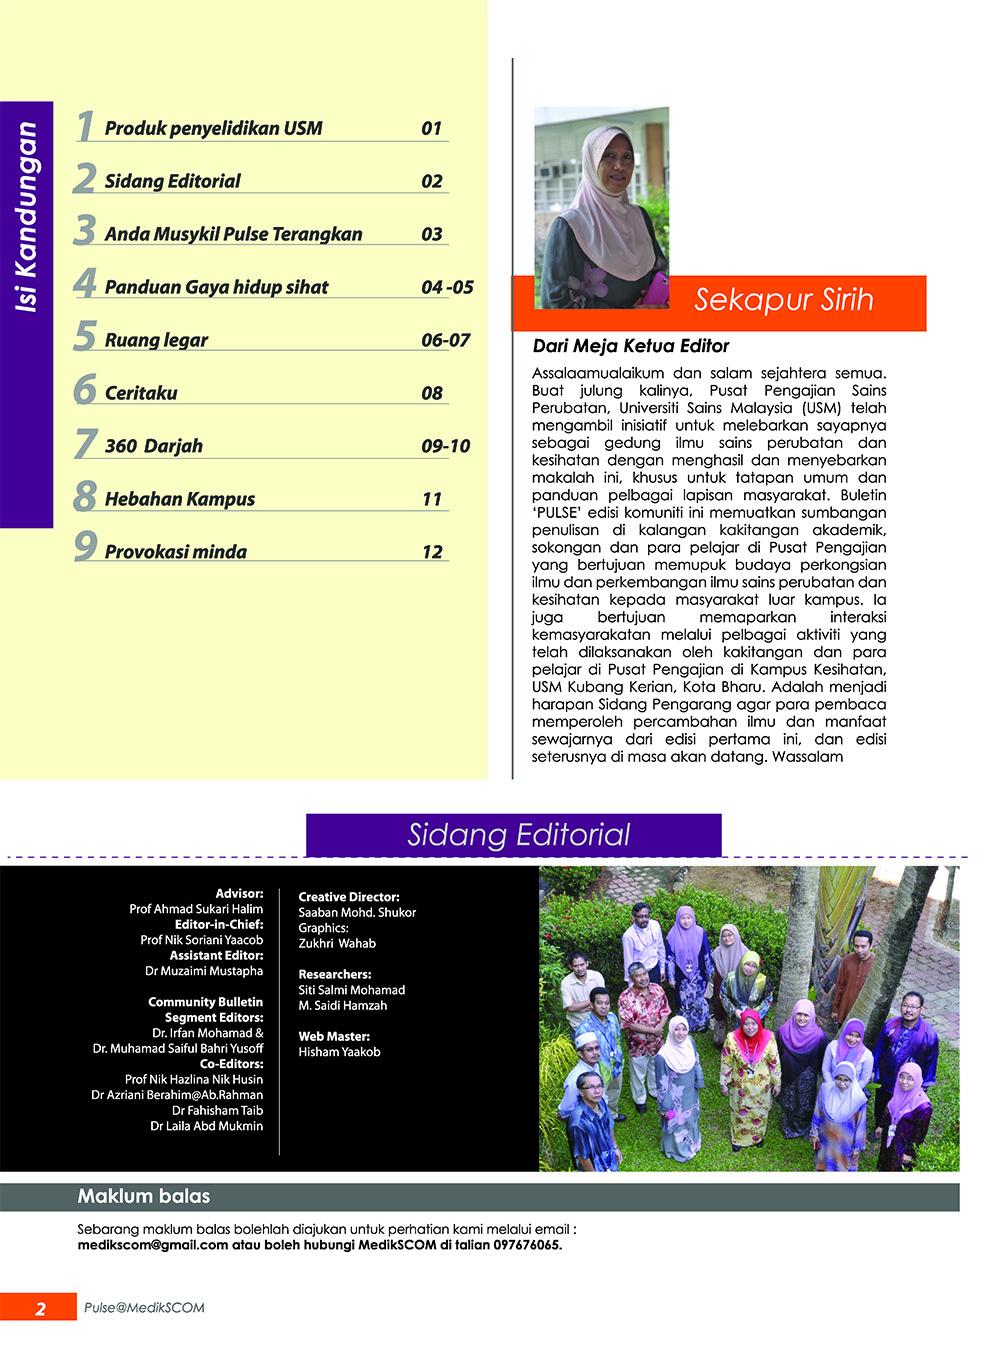 pulsemedikscomcommunitydec2013-1_page_2